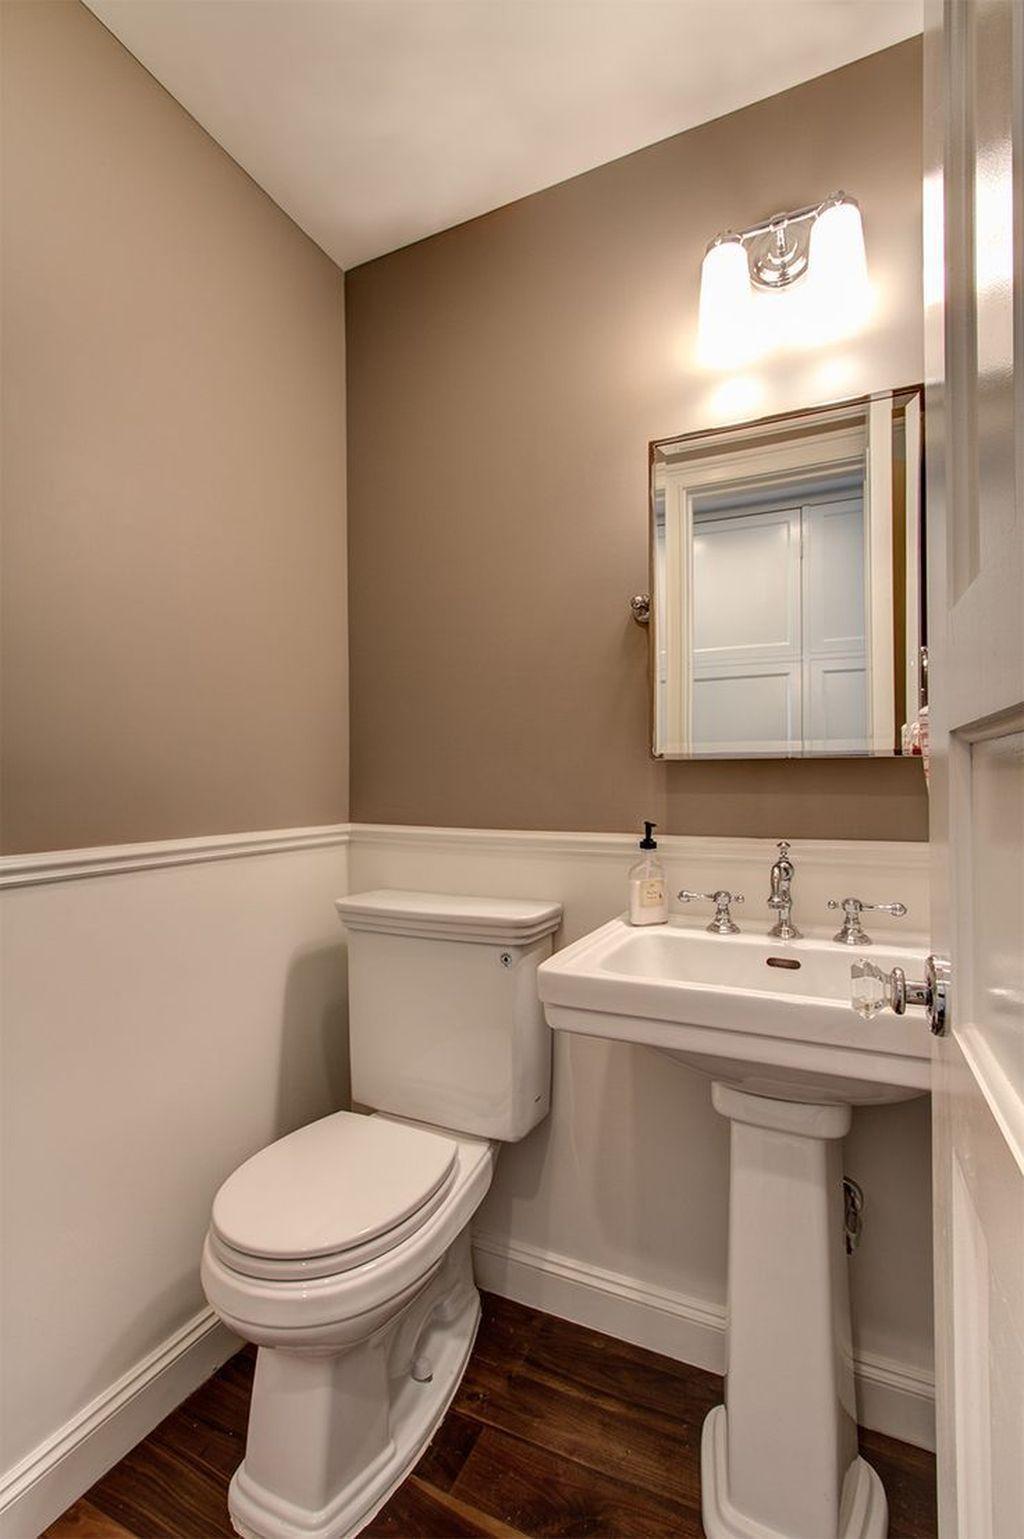 32 inspiring traditional bathroom design ideas  small